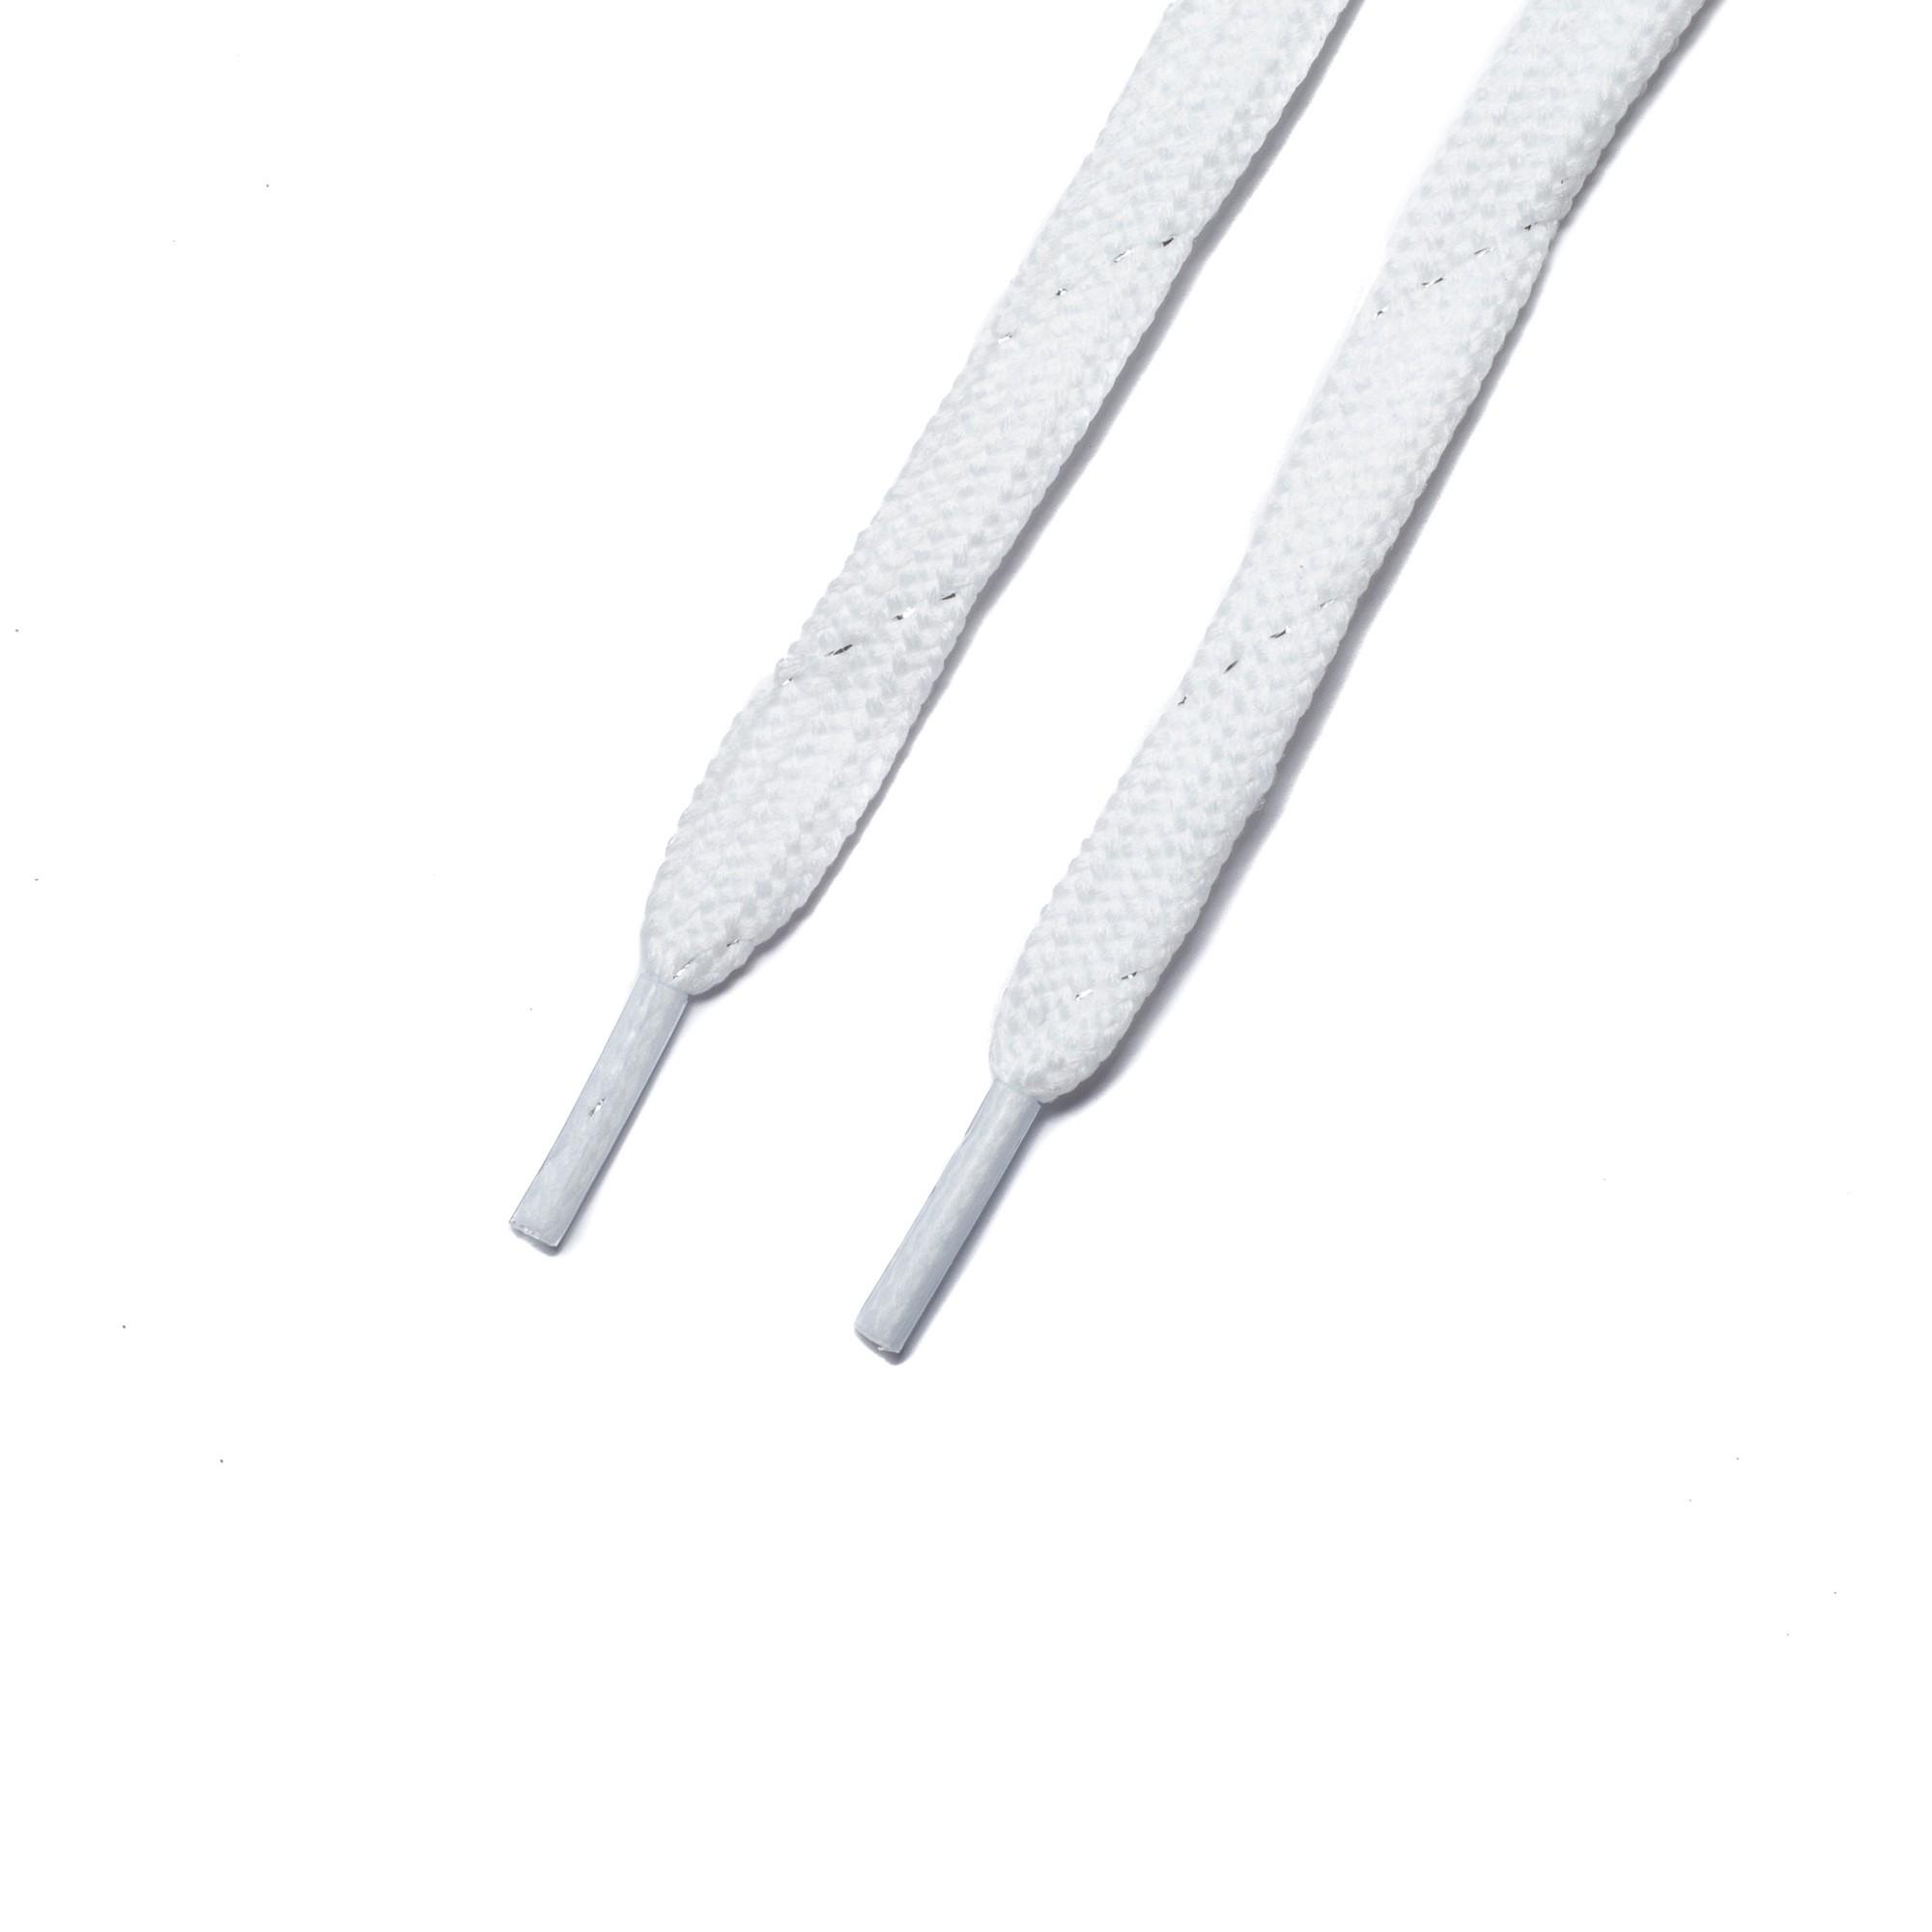 CADARÇO METALLIC STRIPES WHITE/SILVER